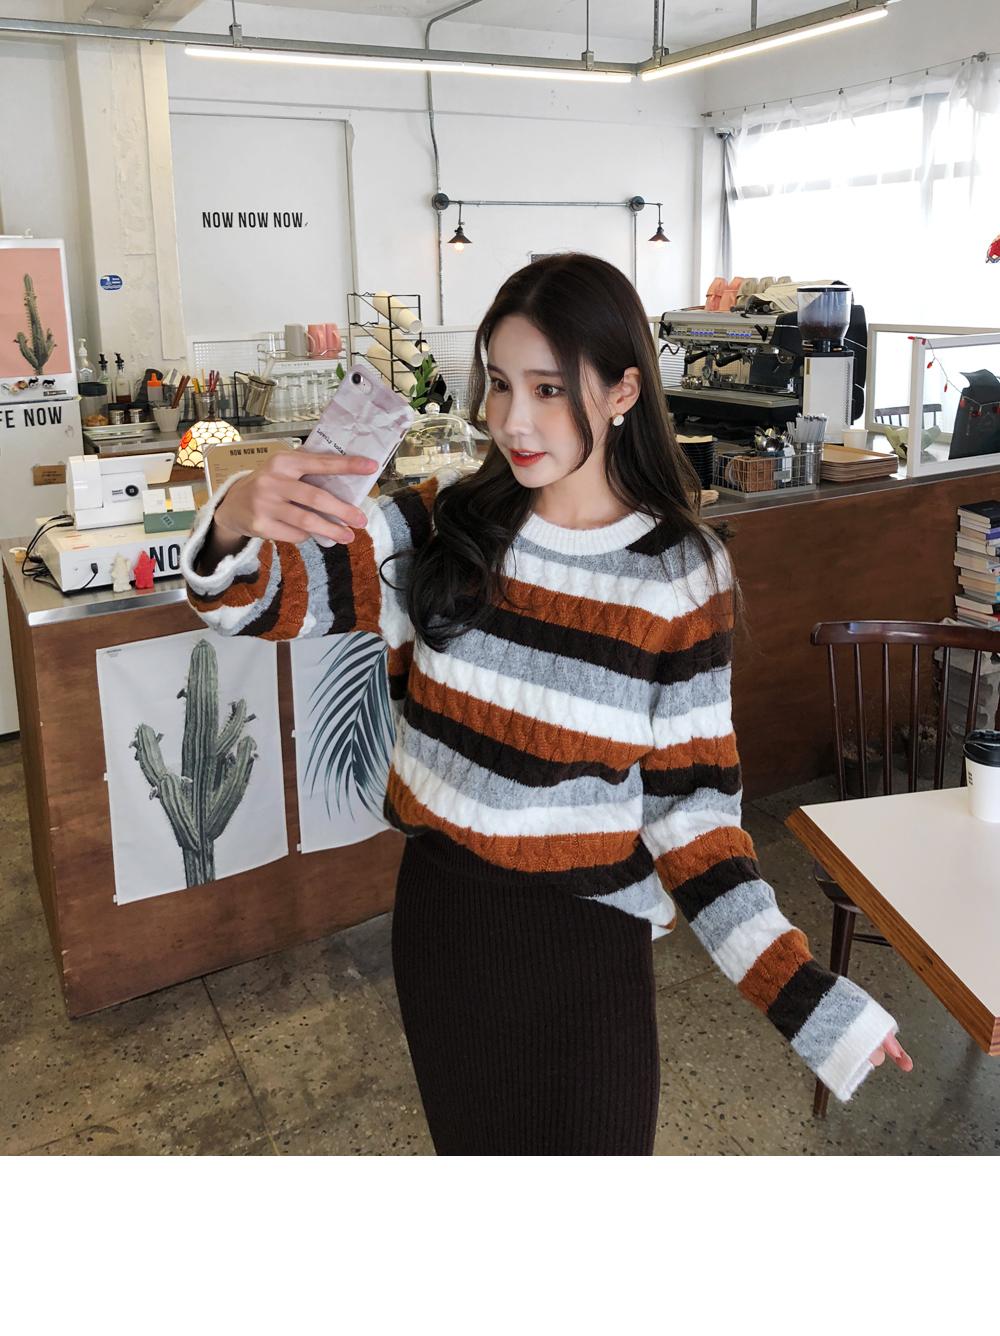 Utility knit skirt